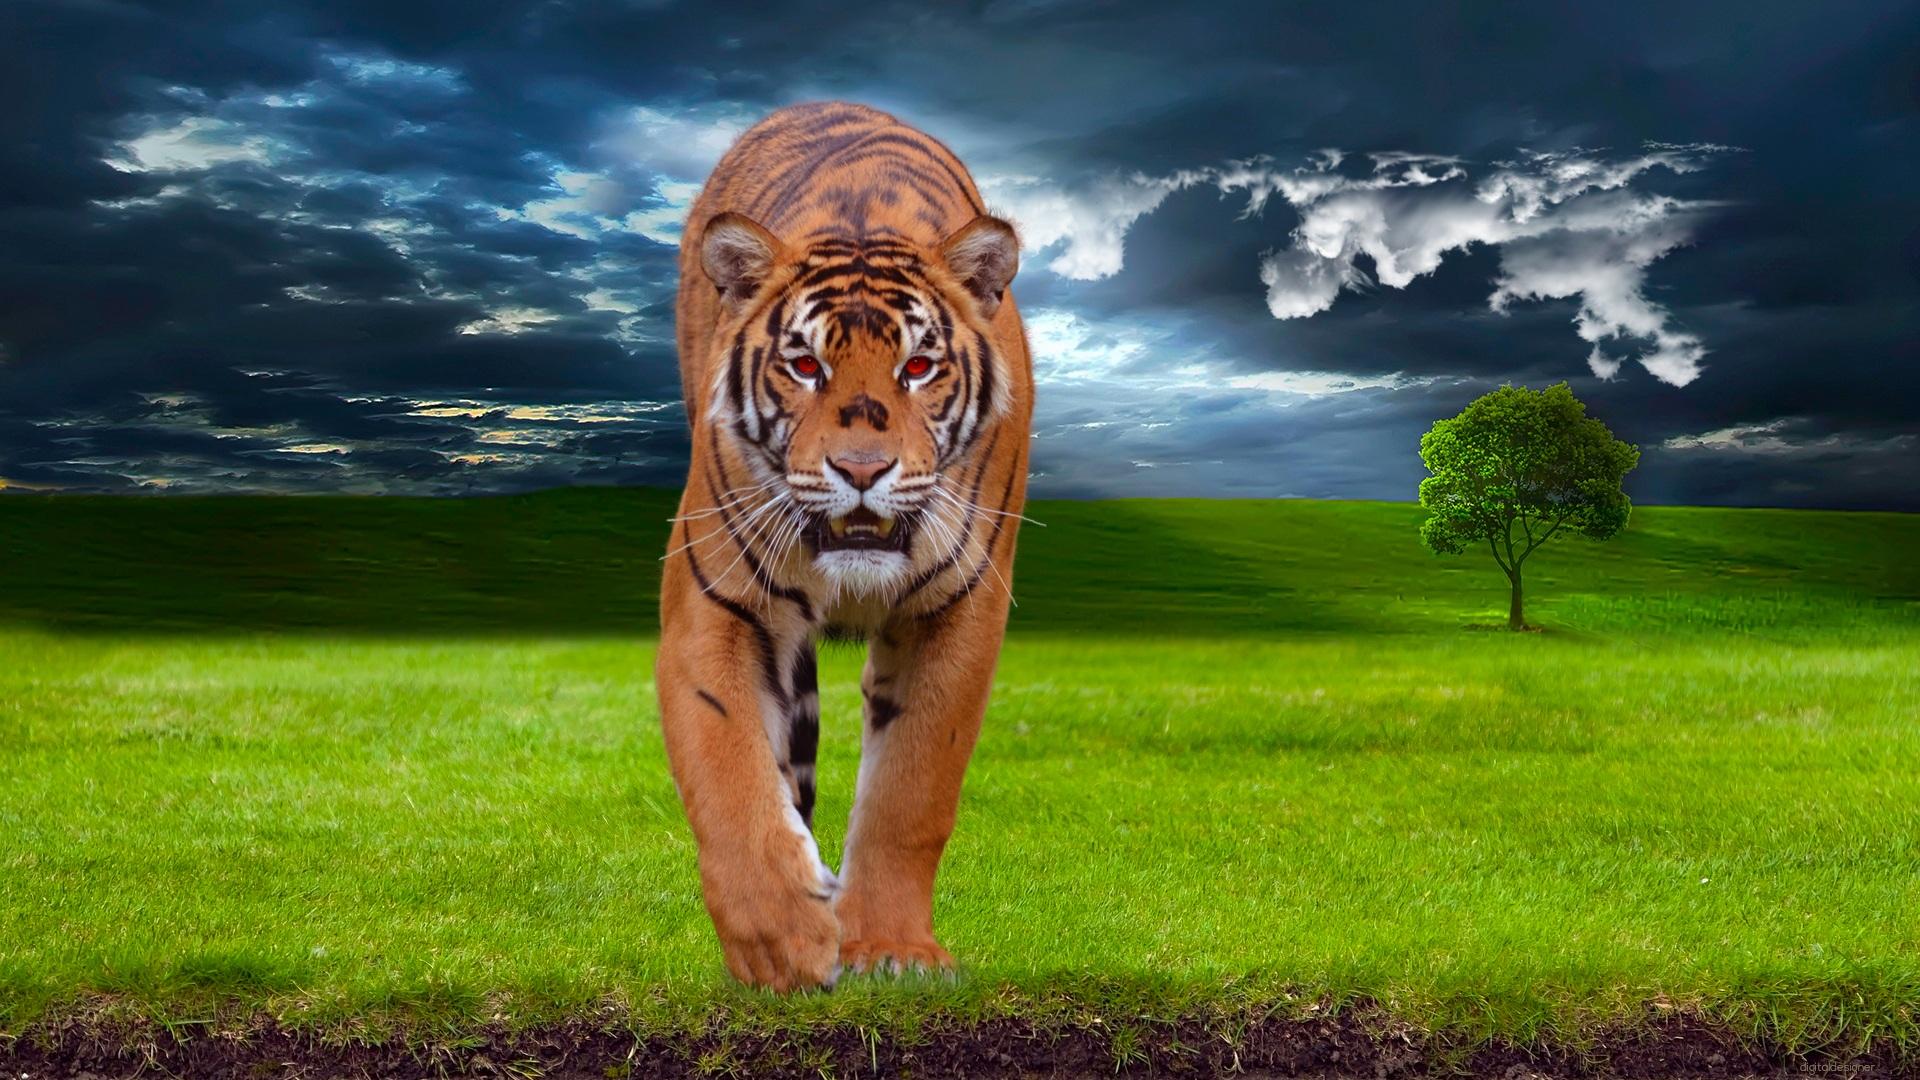 8k Animal Wallpaper Download: Free Images : Landscape, Tree, Nature, Forest, Grass